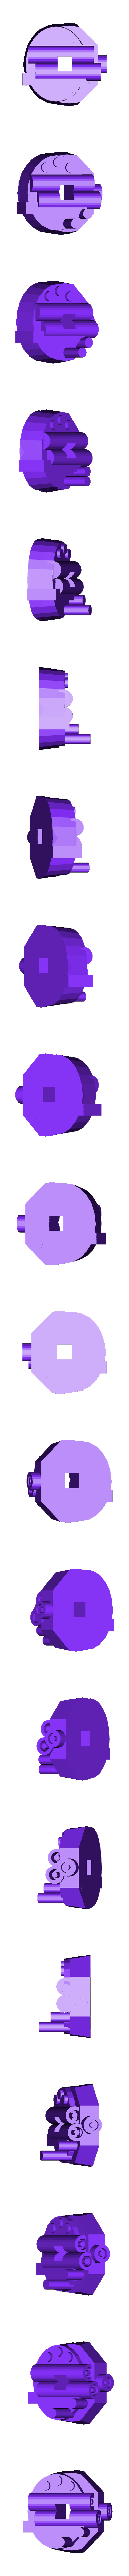 Head 5 Robot Soldier 28mm group 1.stl Download STL file Support-Free Chaingun Robot • 3D printer template, Ellie_Valkyrie